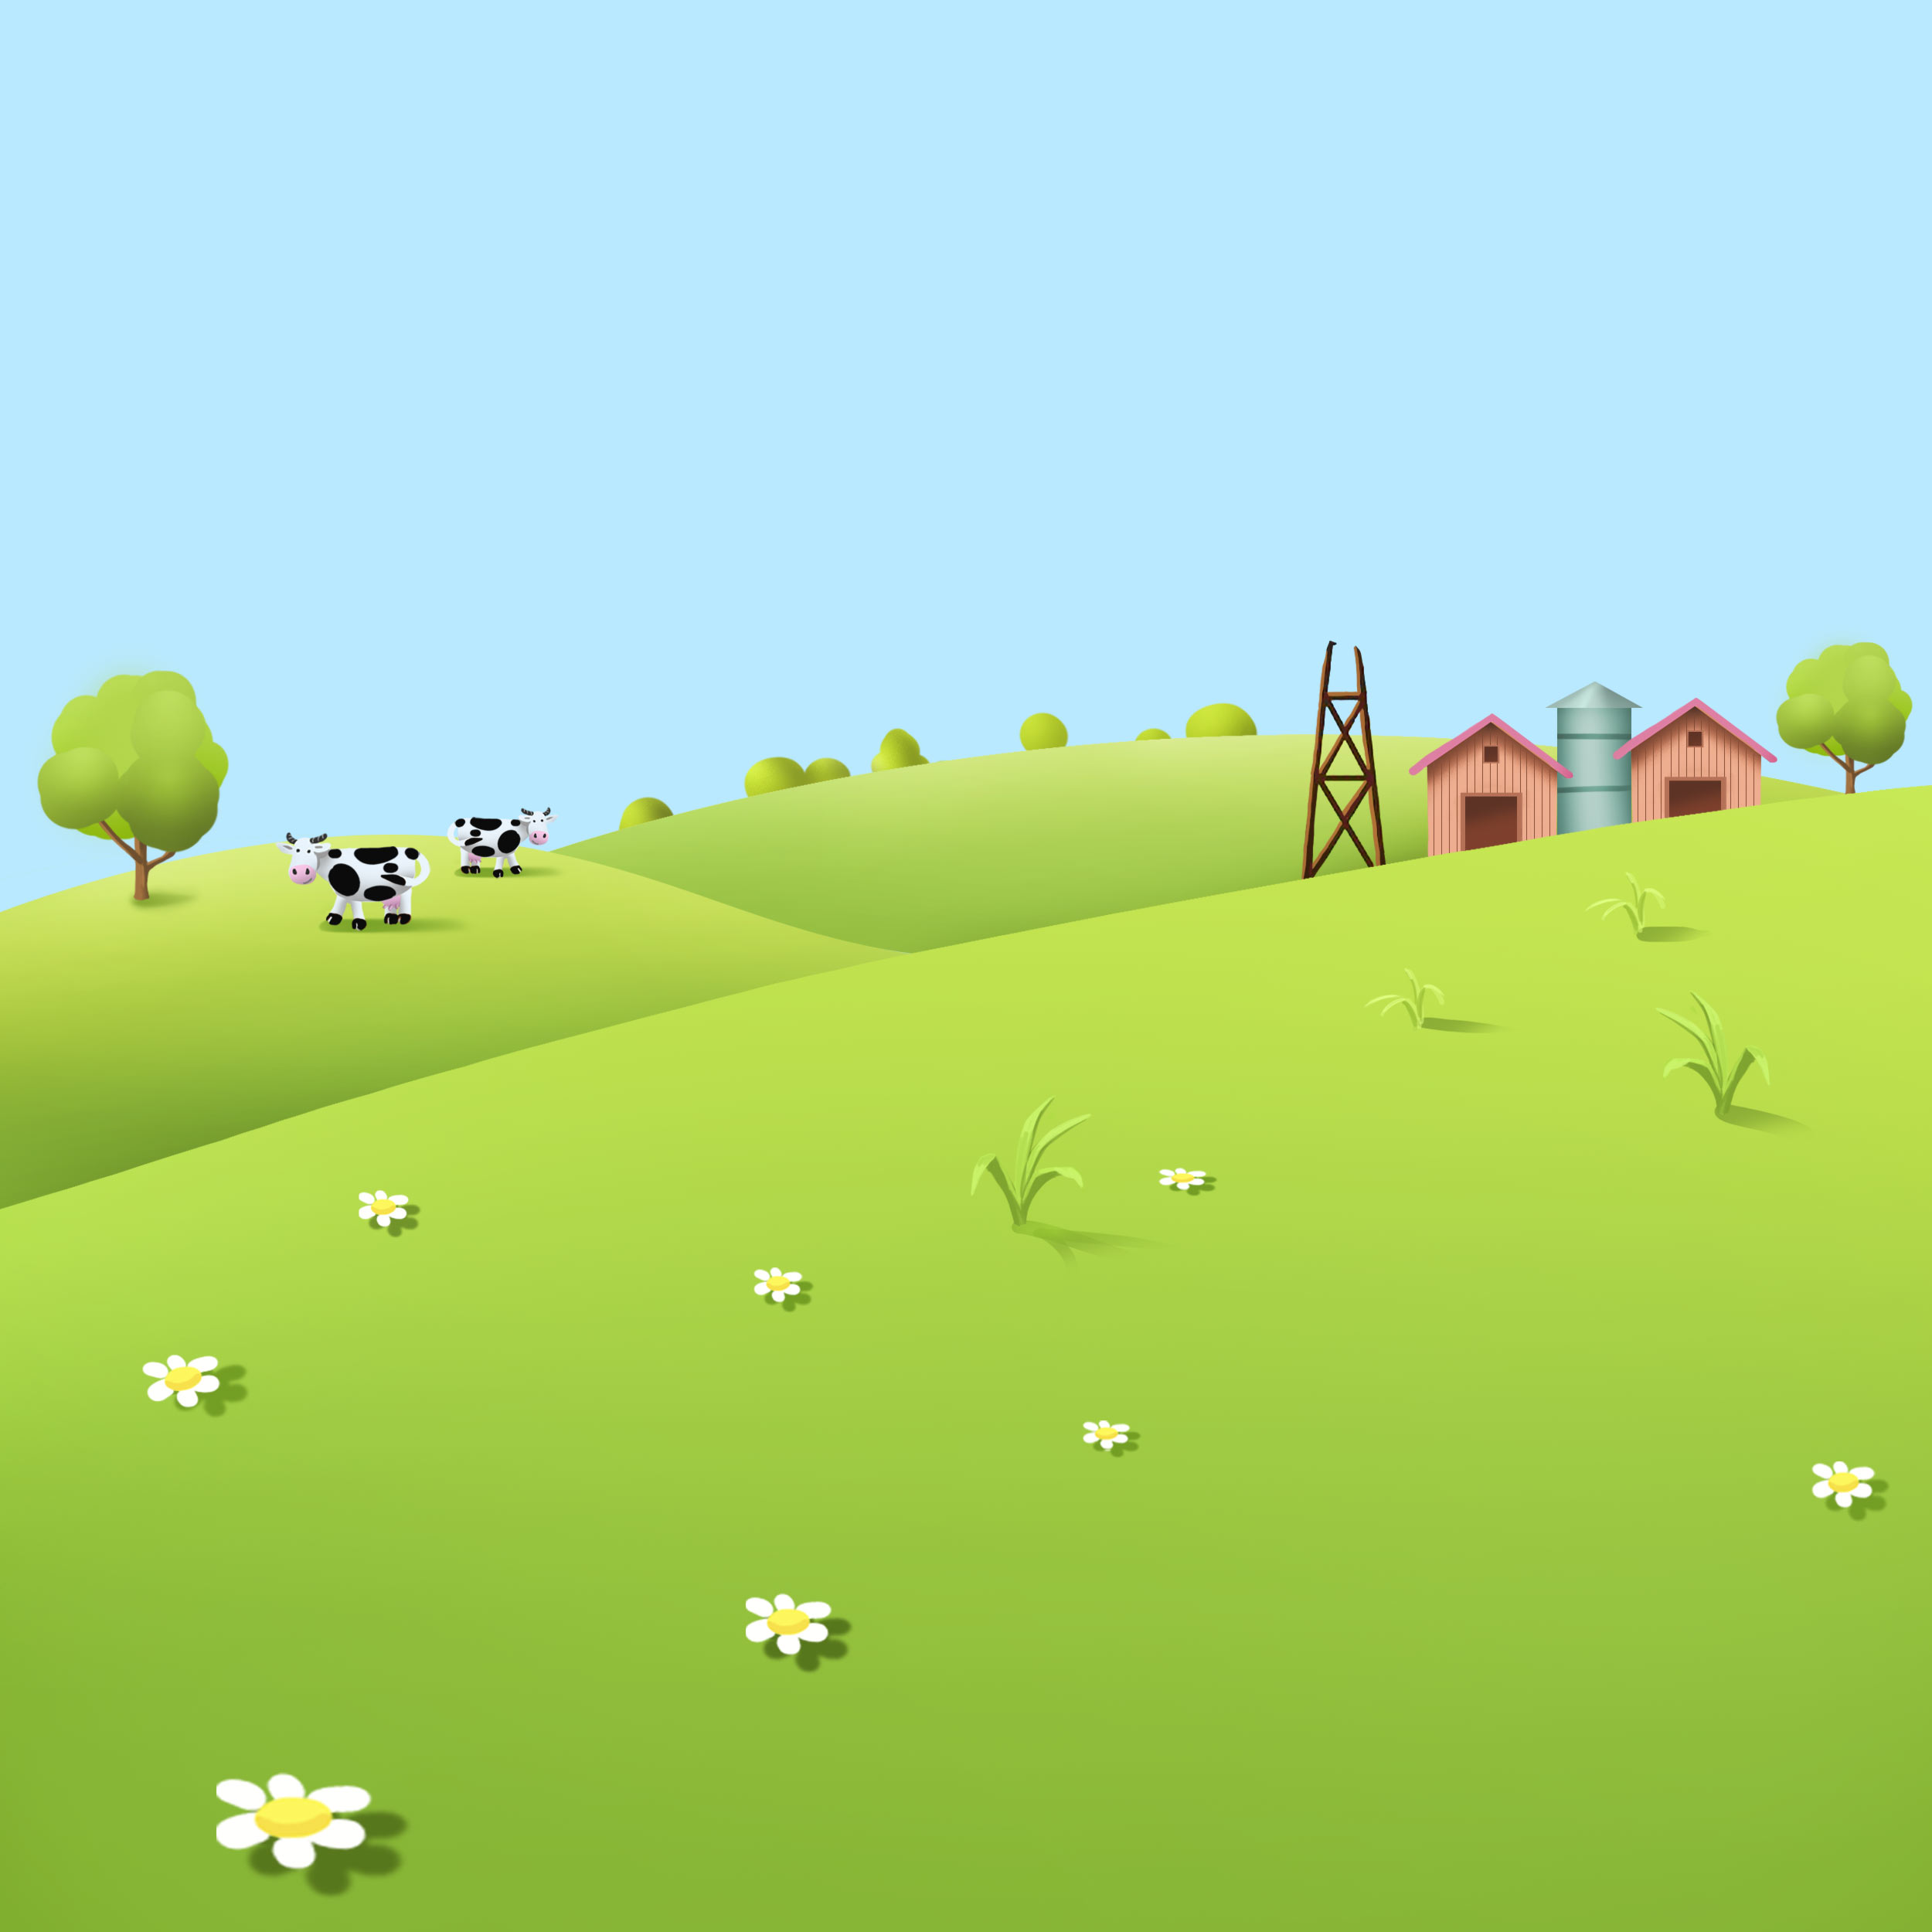 matyldina farma farma